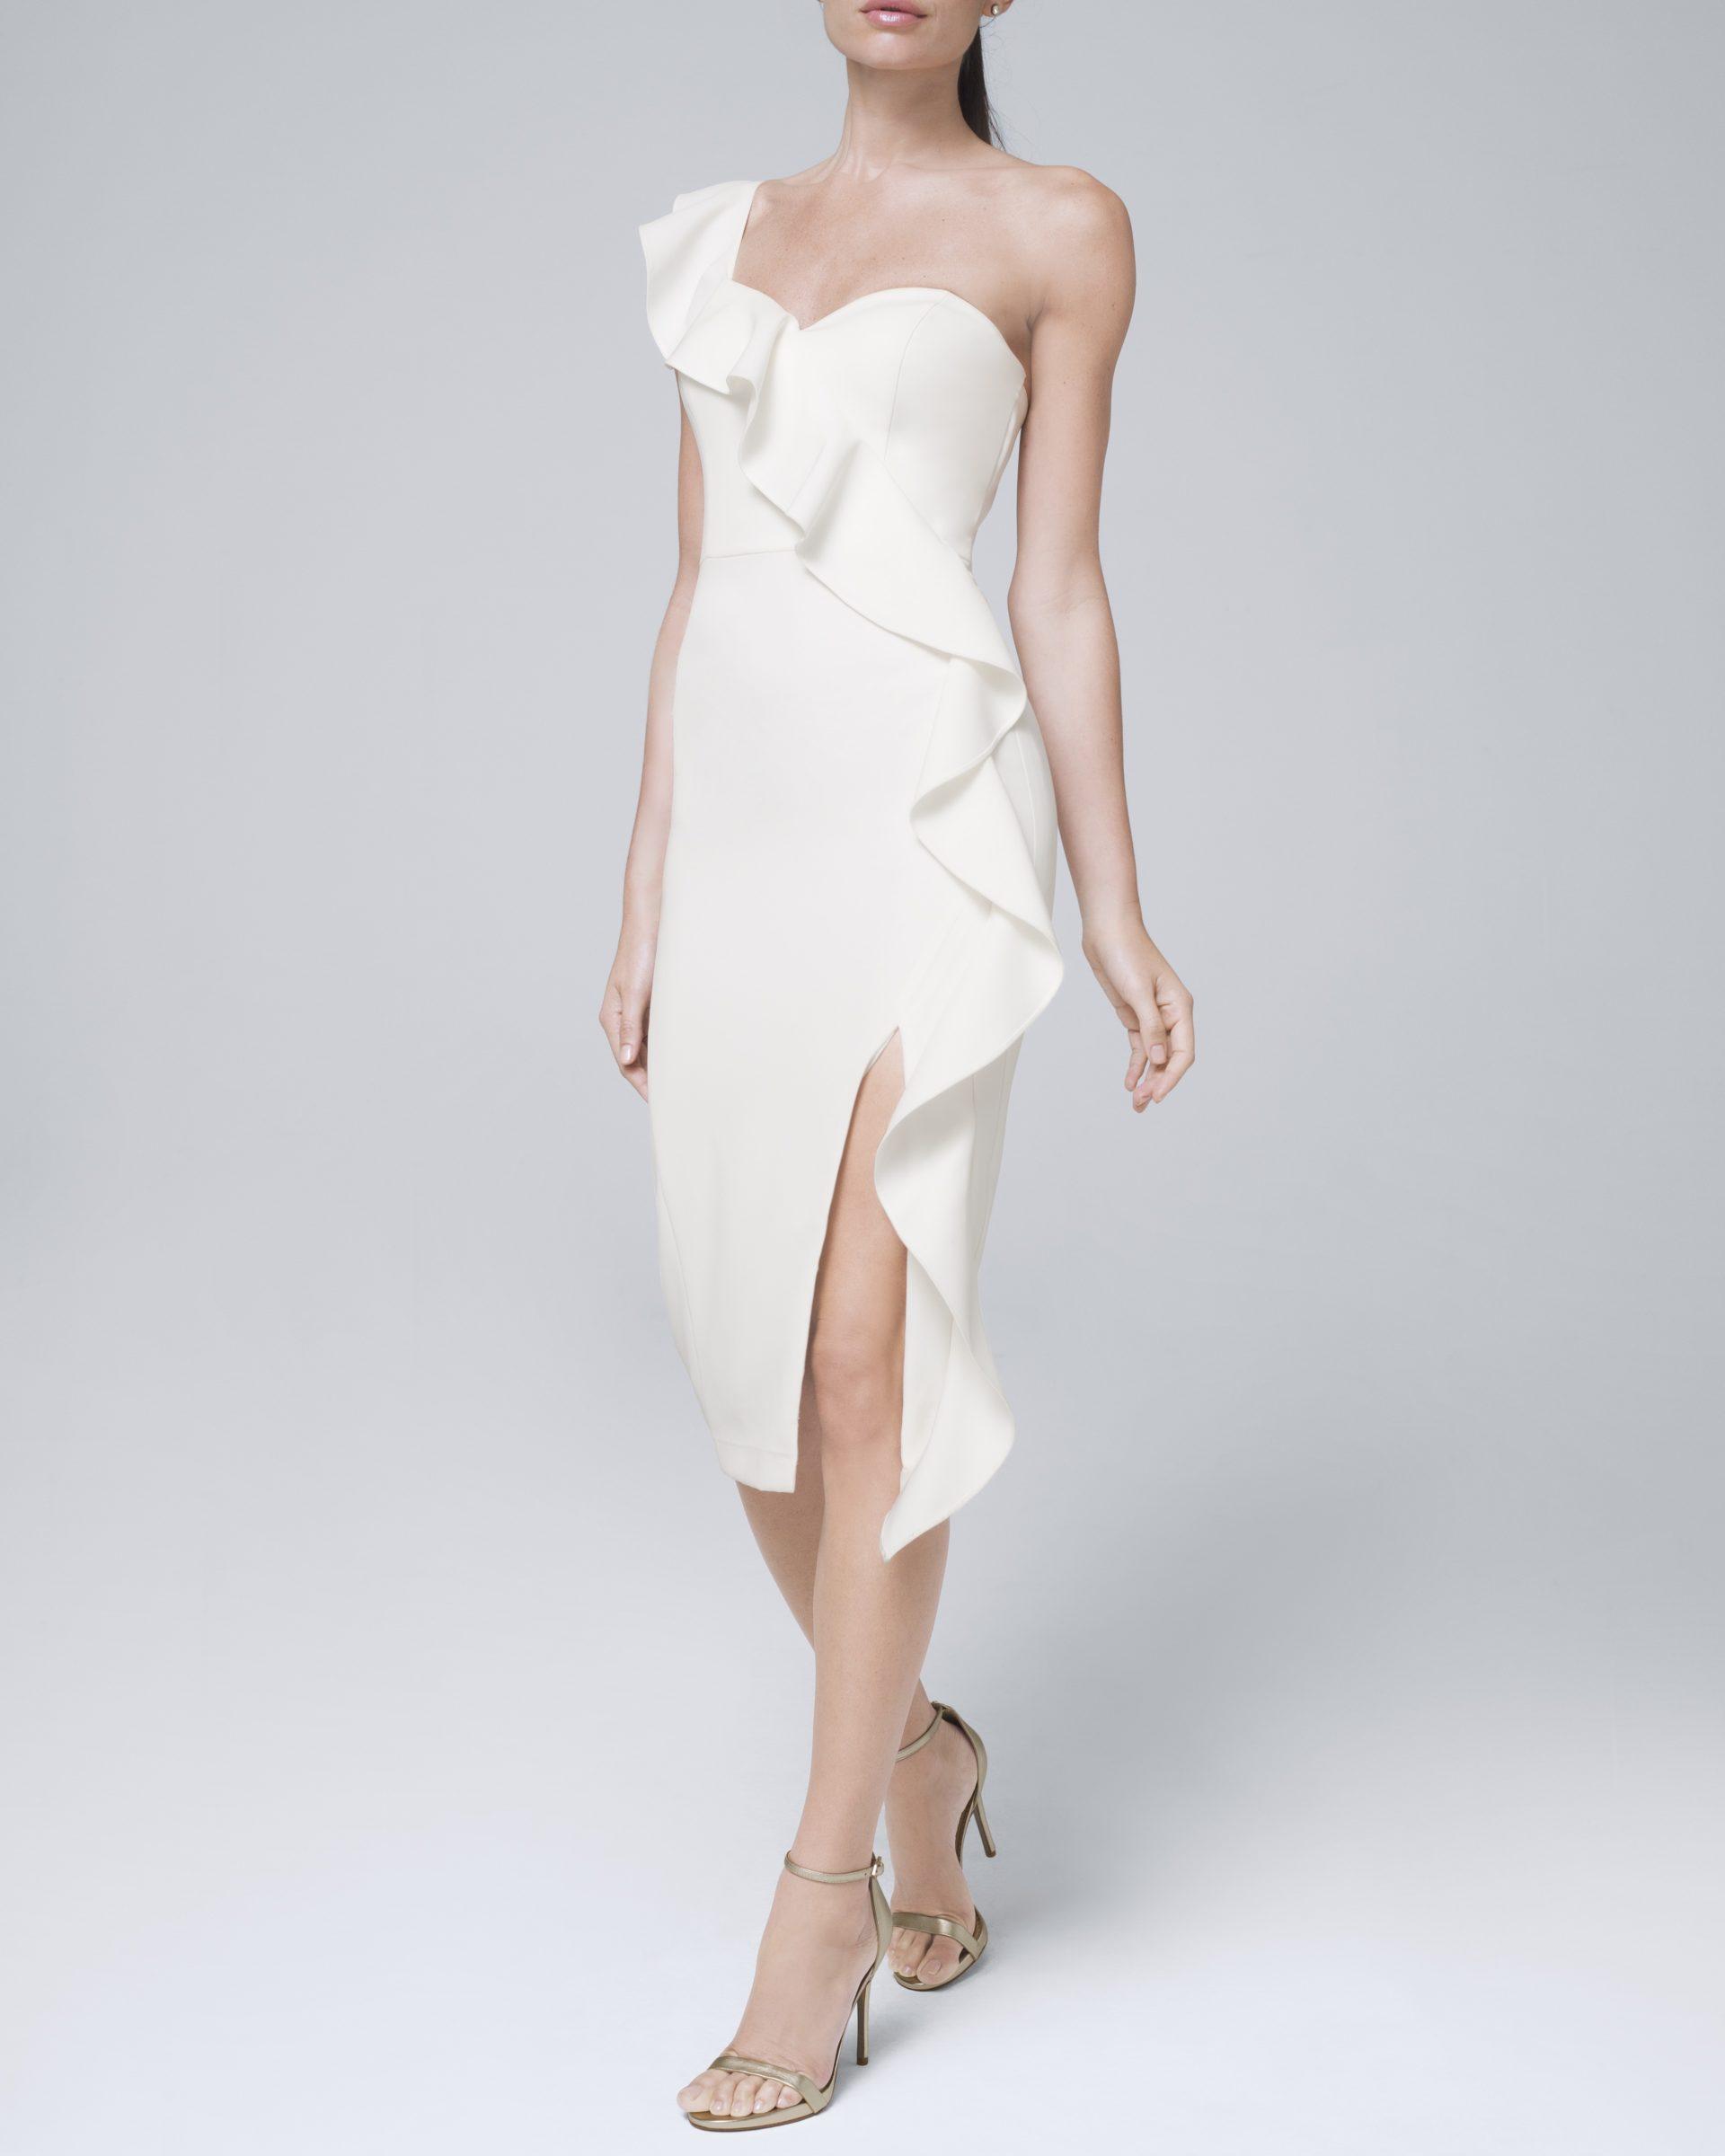 Ruffled midi dress for micro wedding